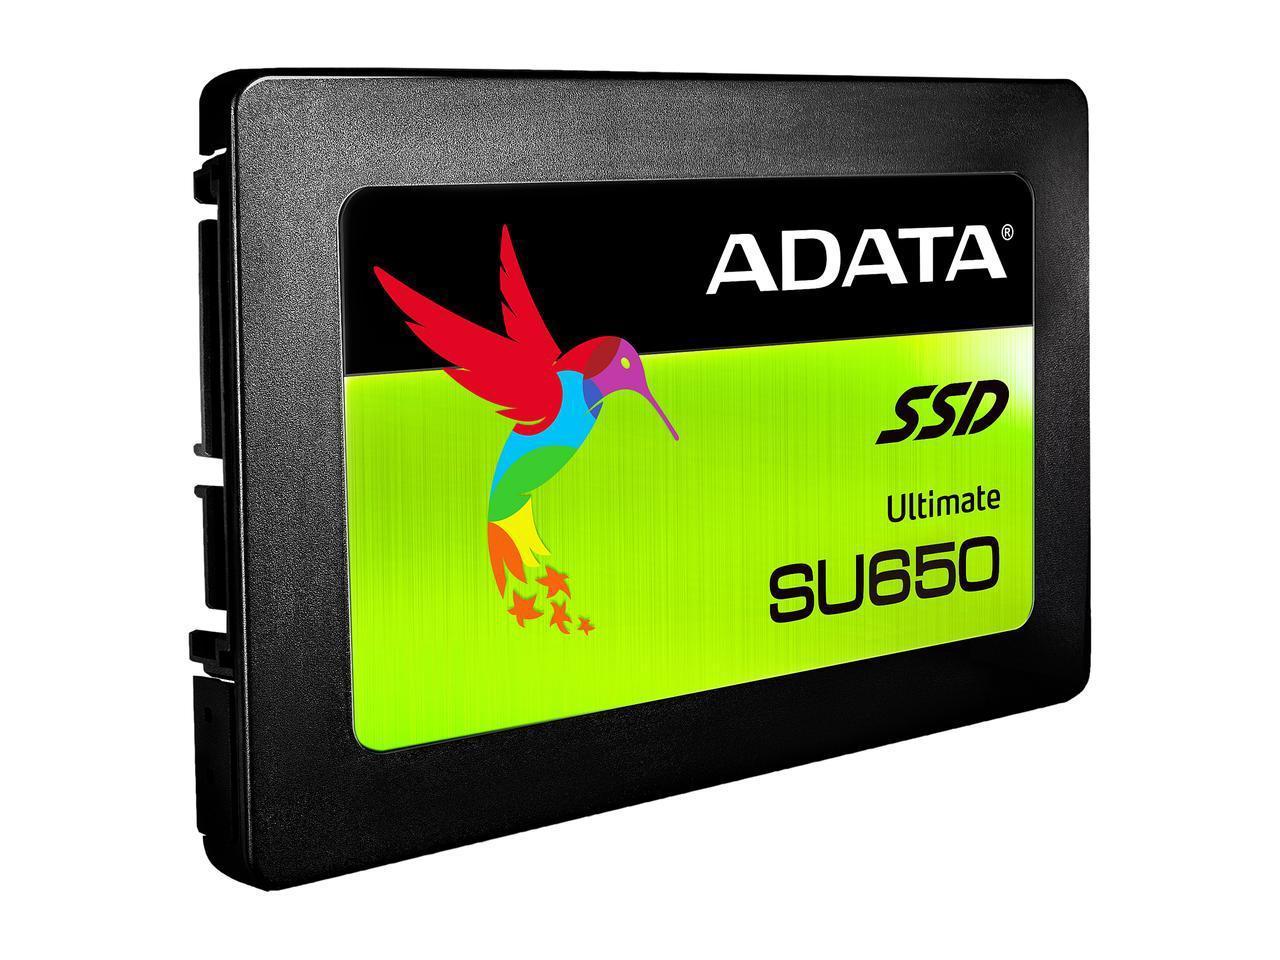 "ADATA Ultimate SU650 2.5"" 120GB 3D NAND (SSD) $28.99"